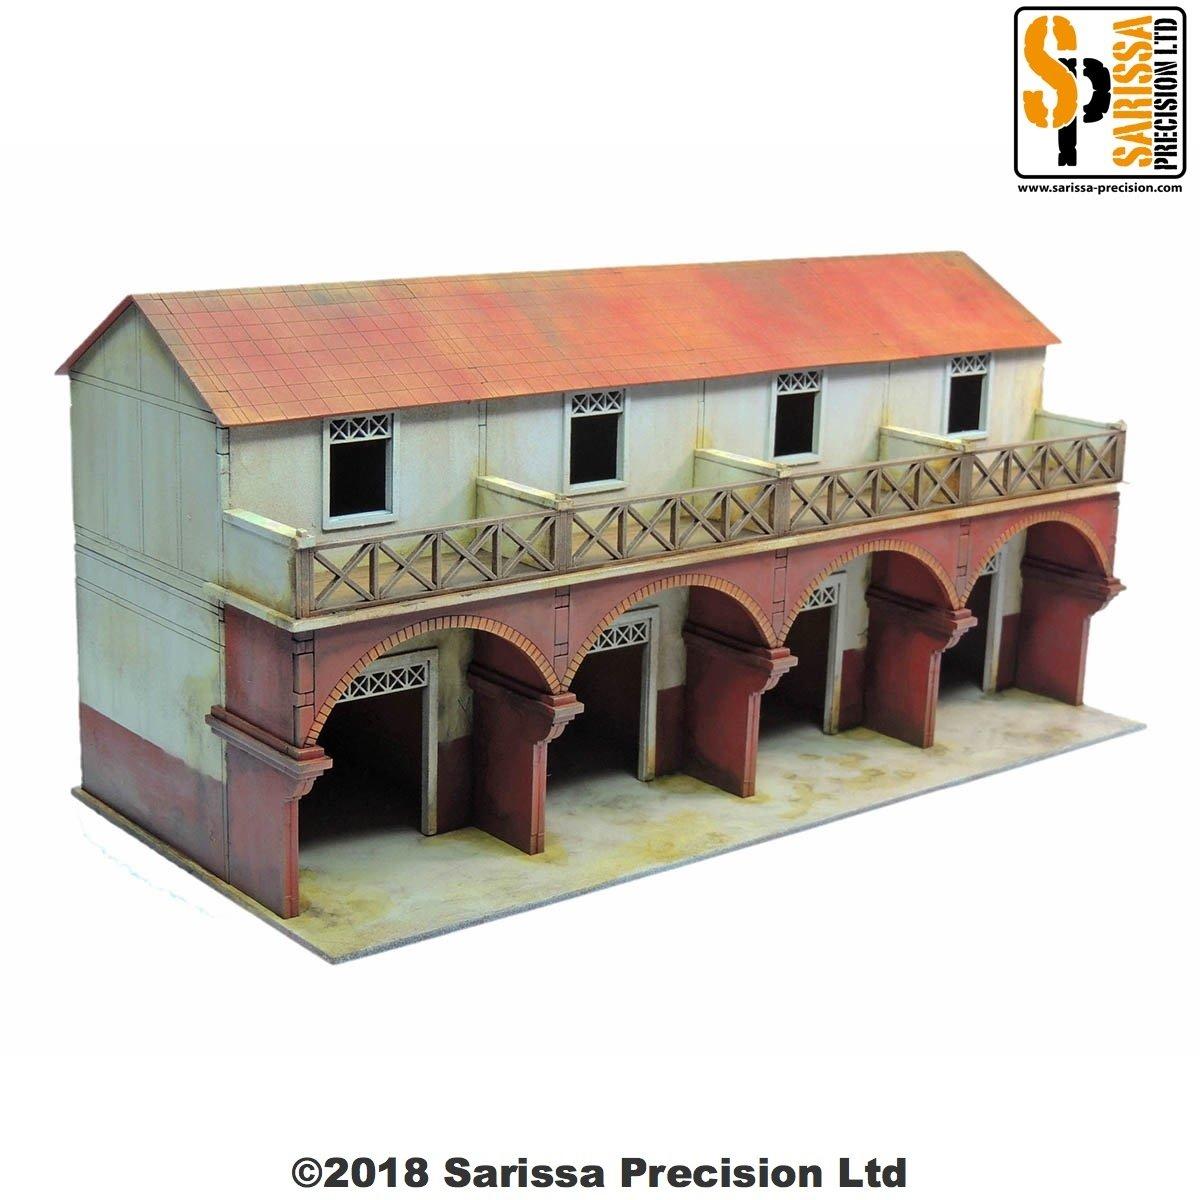 Middle Rank Traders, Sarissa Precision